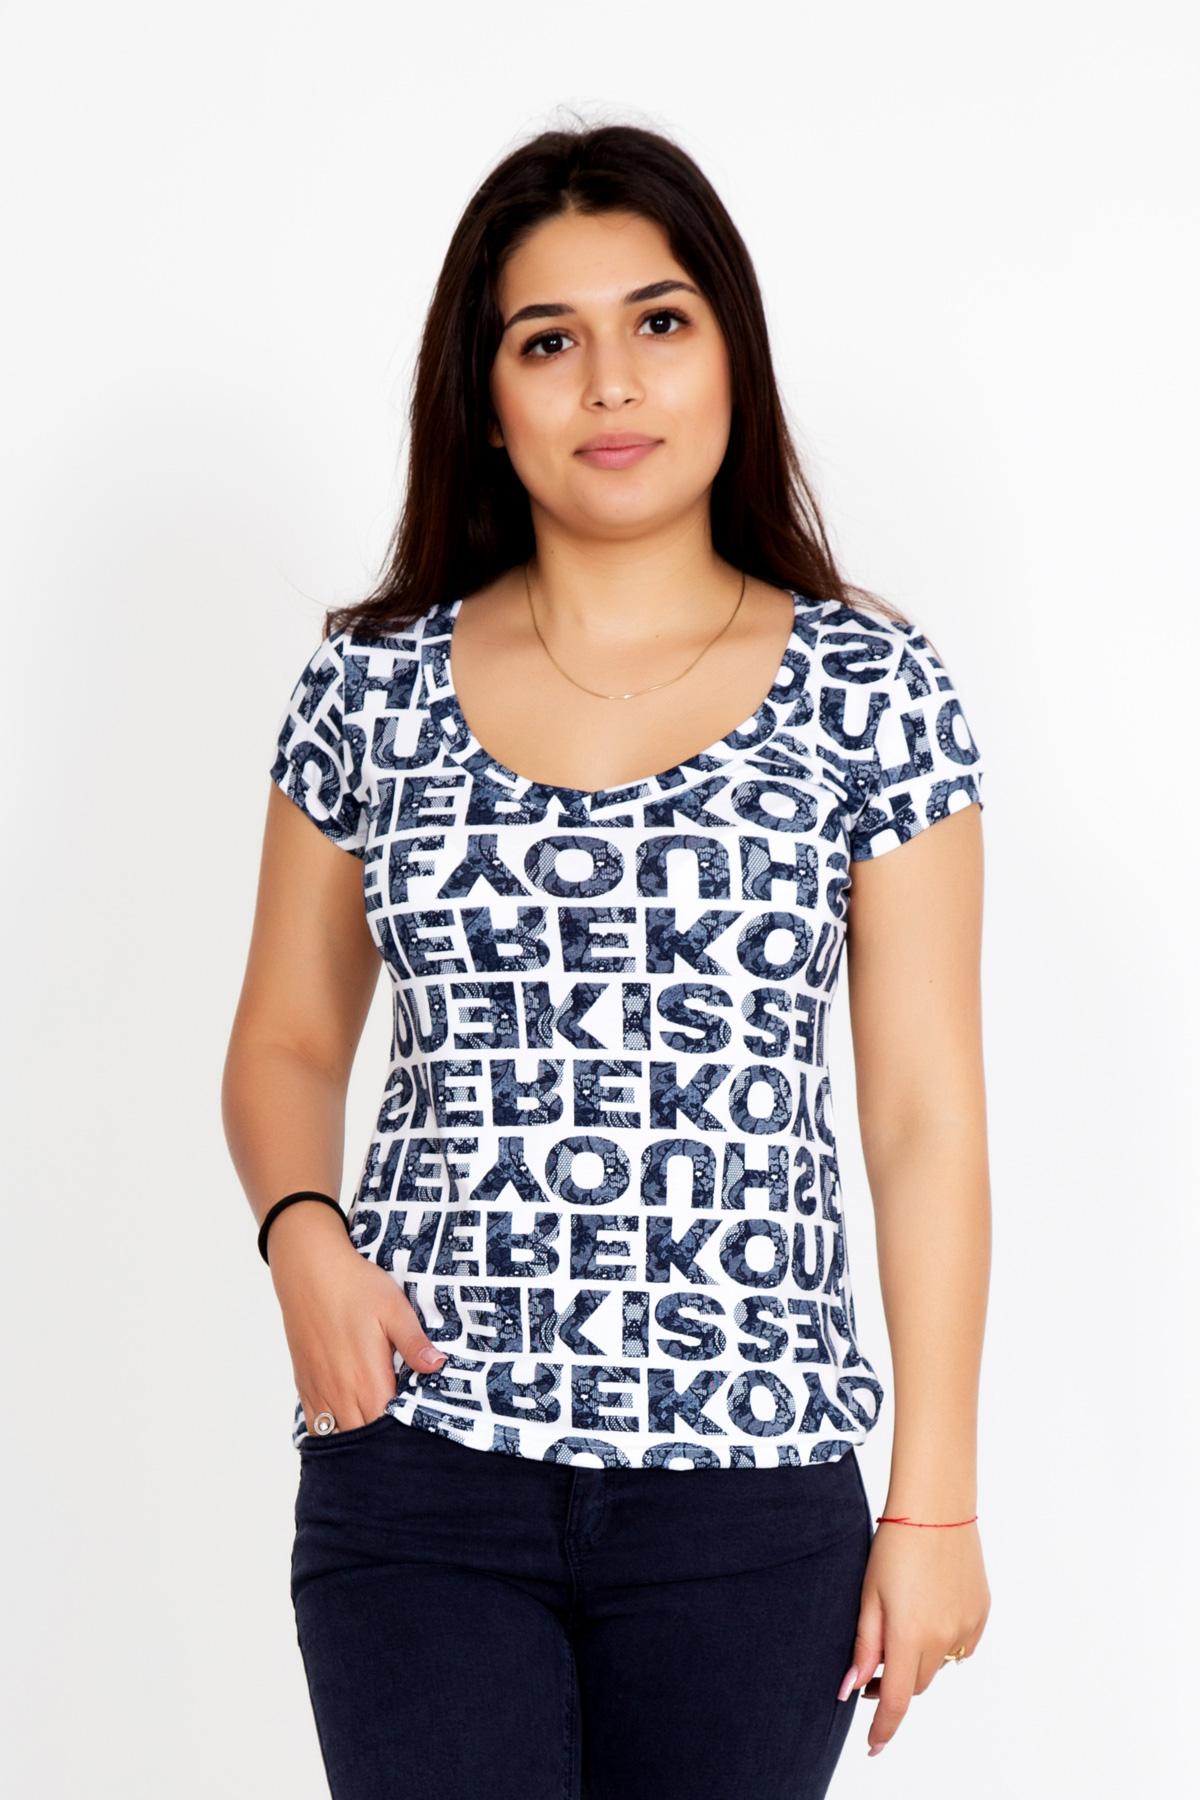 Жен. футболка Лиза р. 46Майки и футболки<br>Факт. ОГ: 78 см <br>Факт. ОТ: 78 см <br>Факт. ОБ: 86 см <br>Длина по спинке: 59 см<br><br>Тип: Жен. футболка<br>Размер: 46<br>Материал: Фулайкра